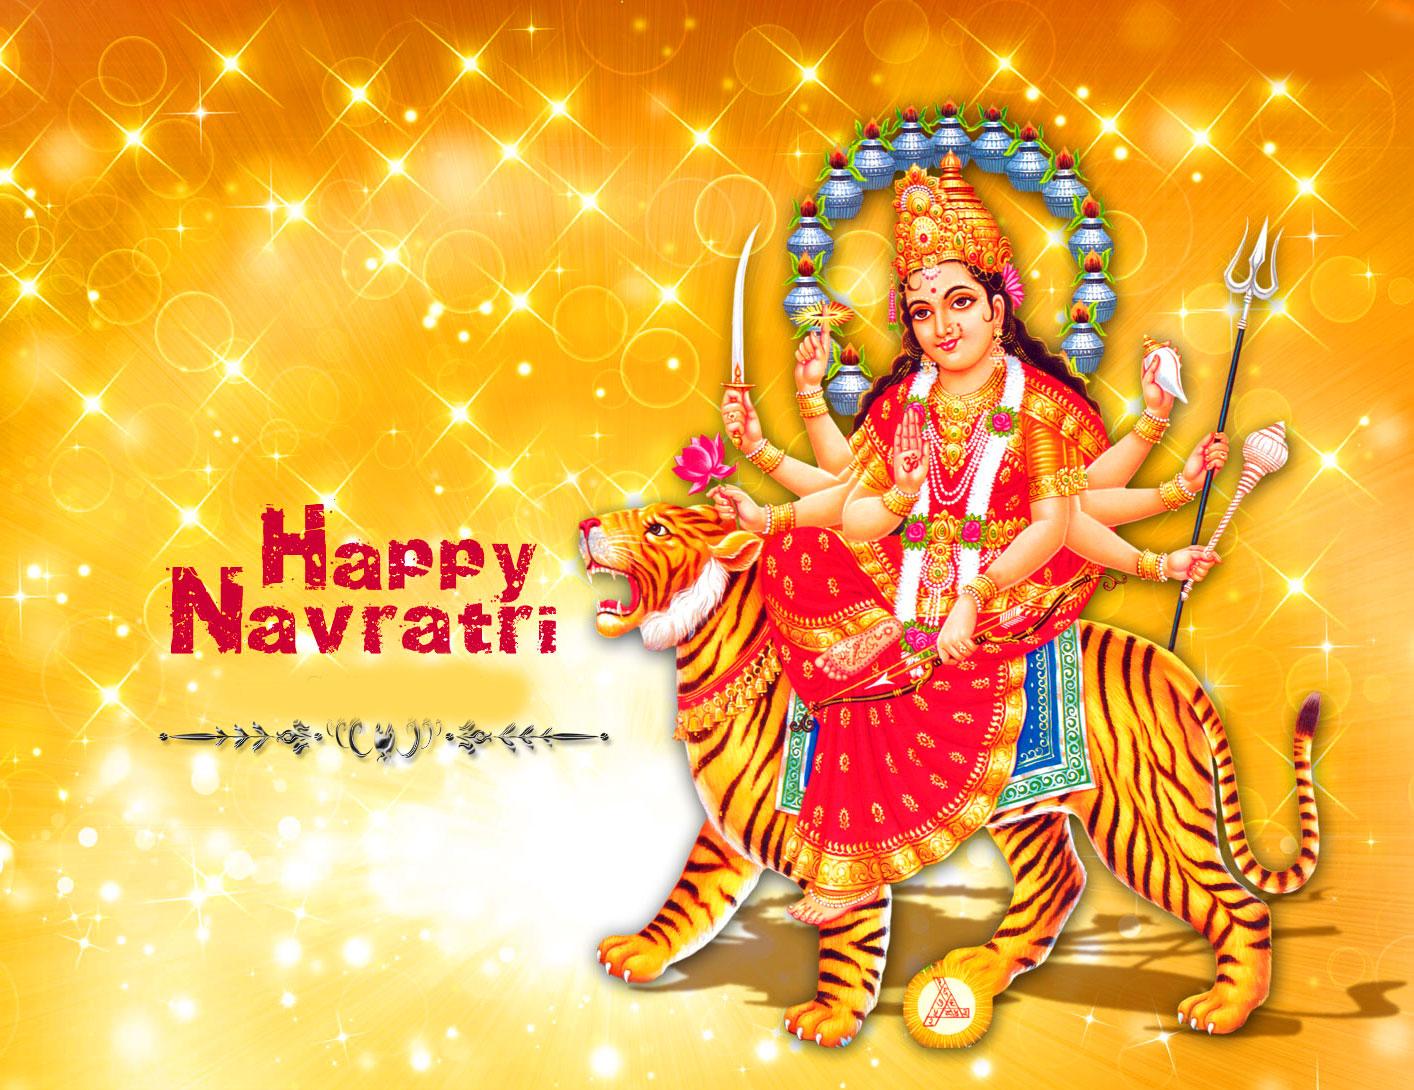 Maa Durga Latest Happy Navratri Images free hd